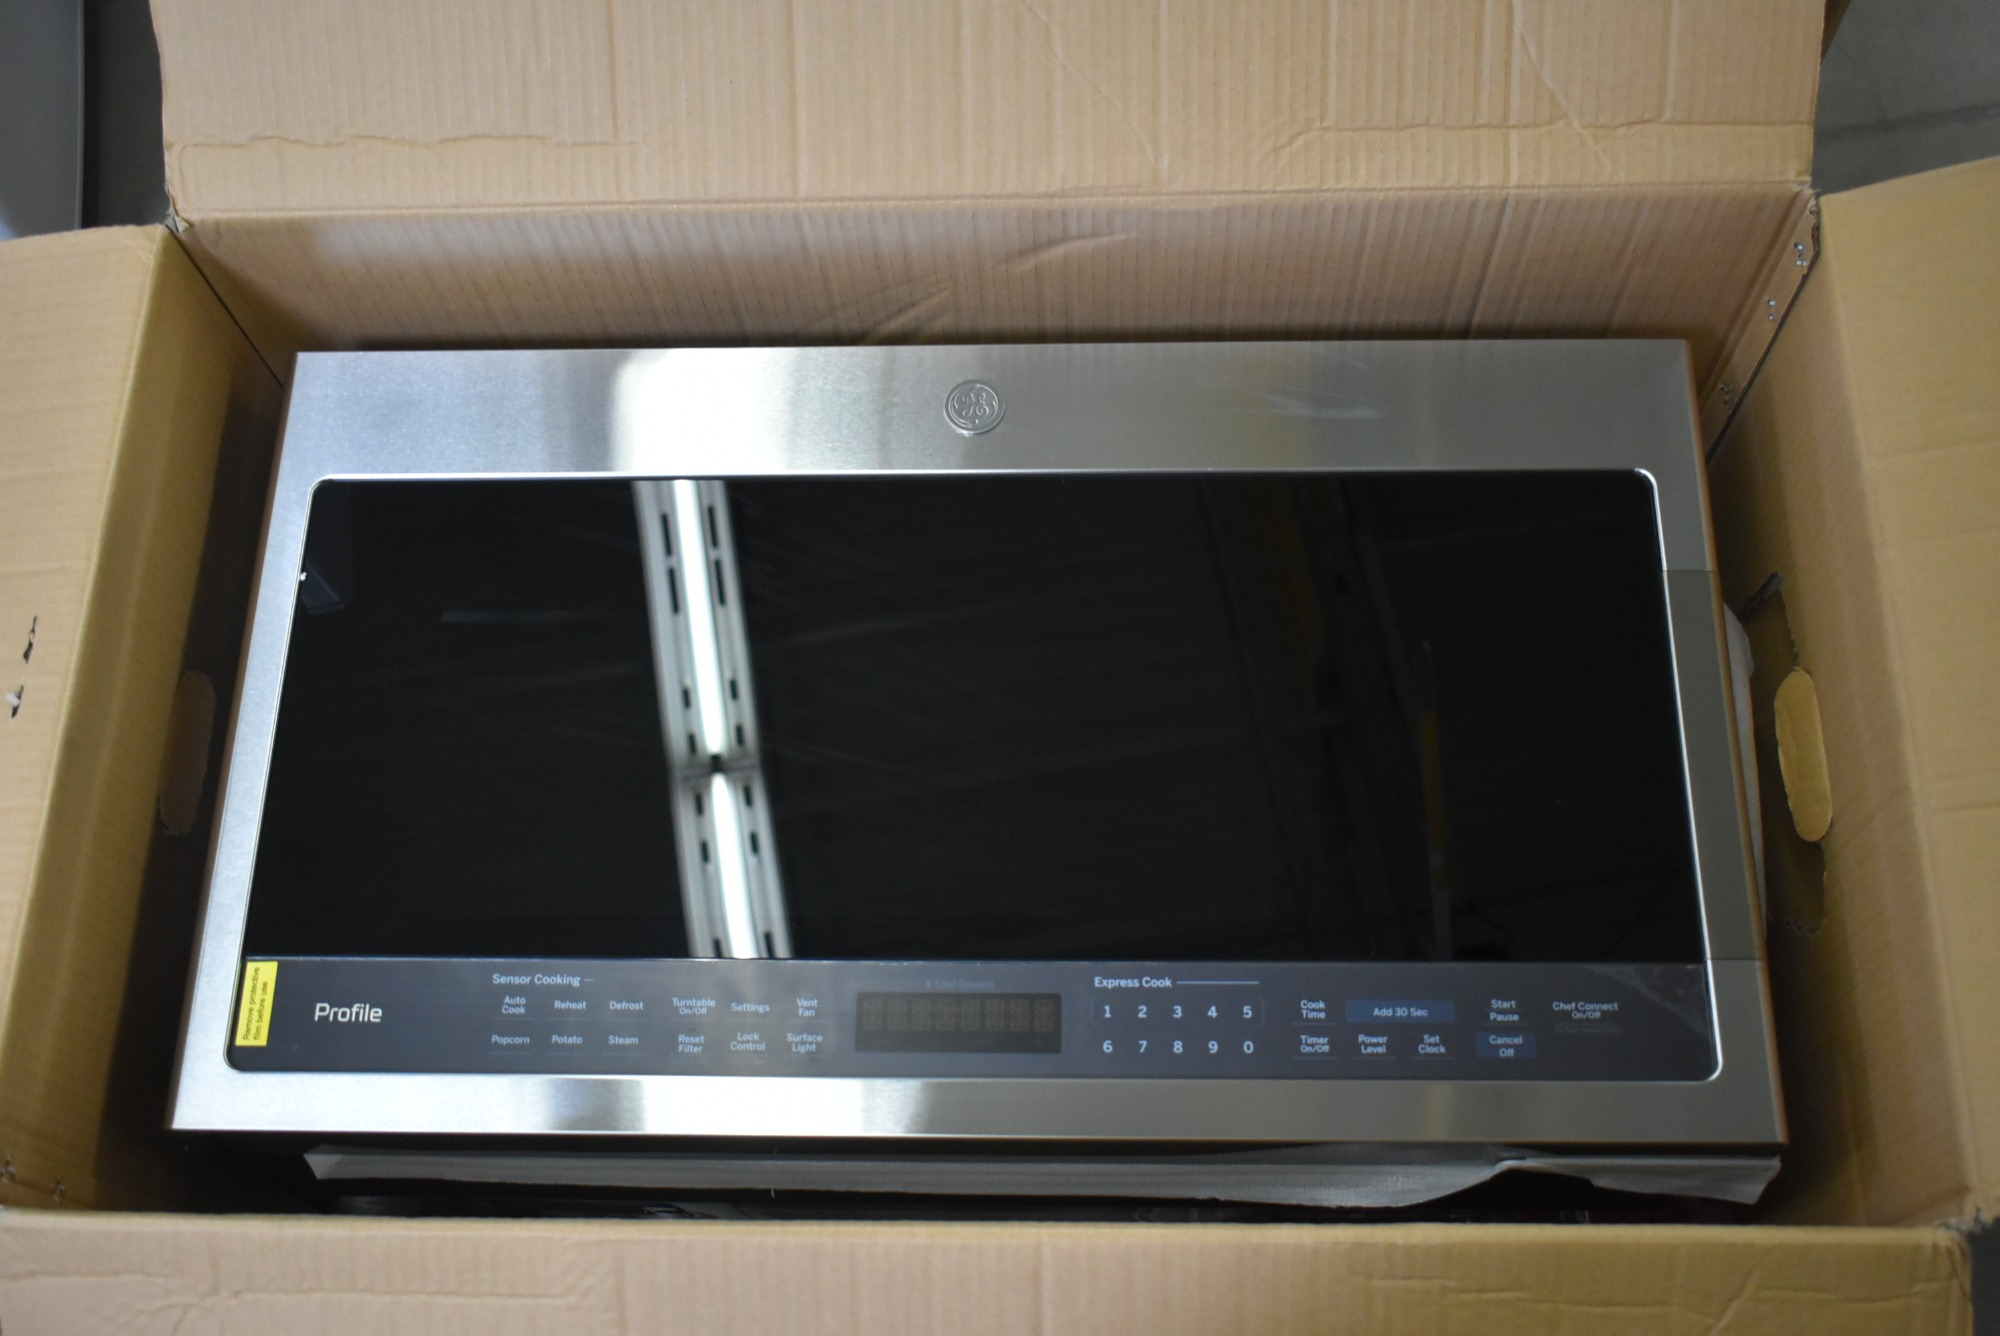 GE PVM9005SJSS 30